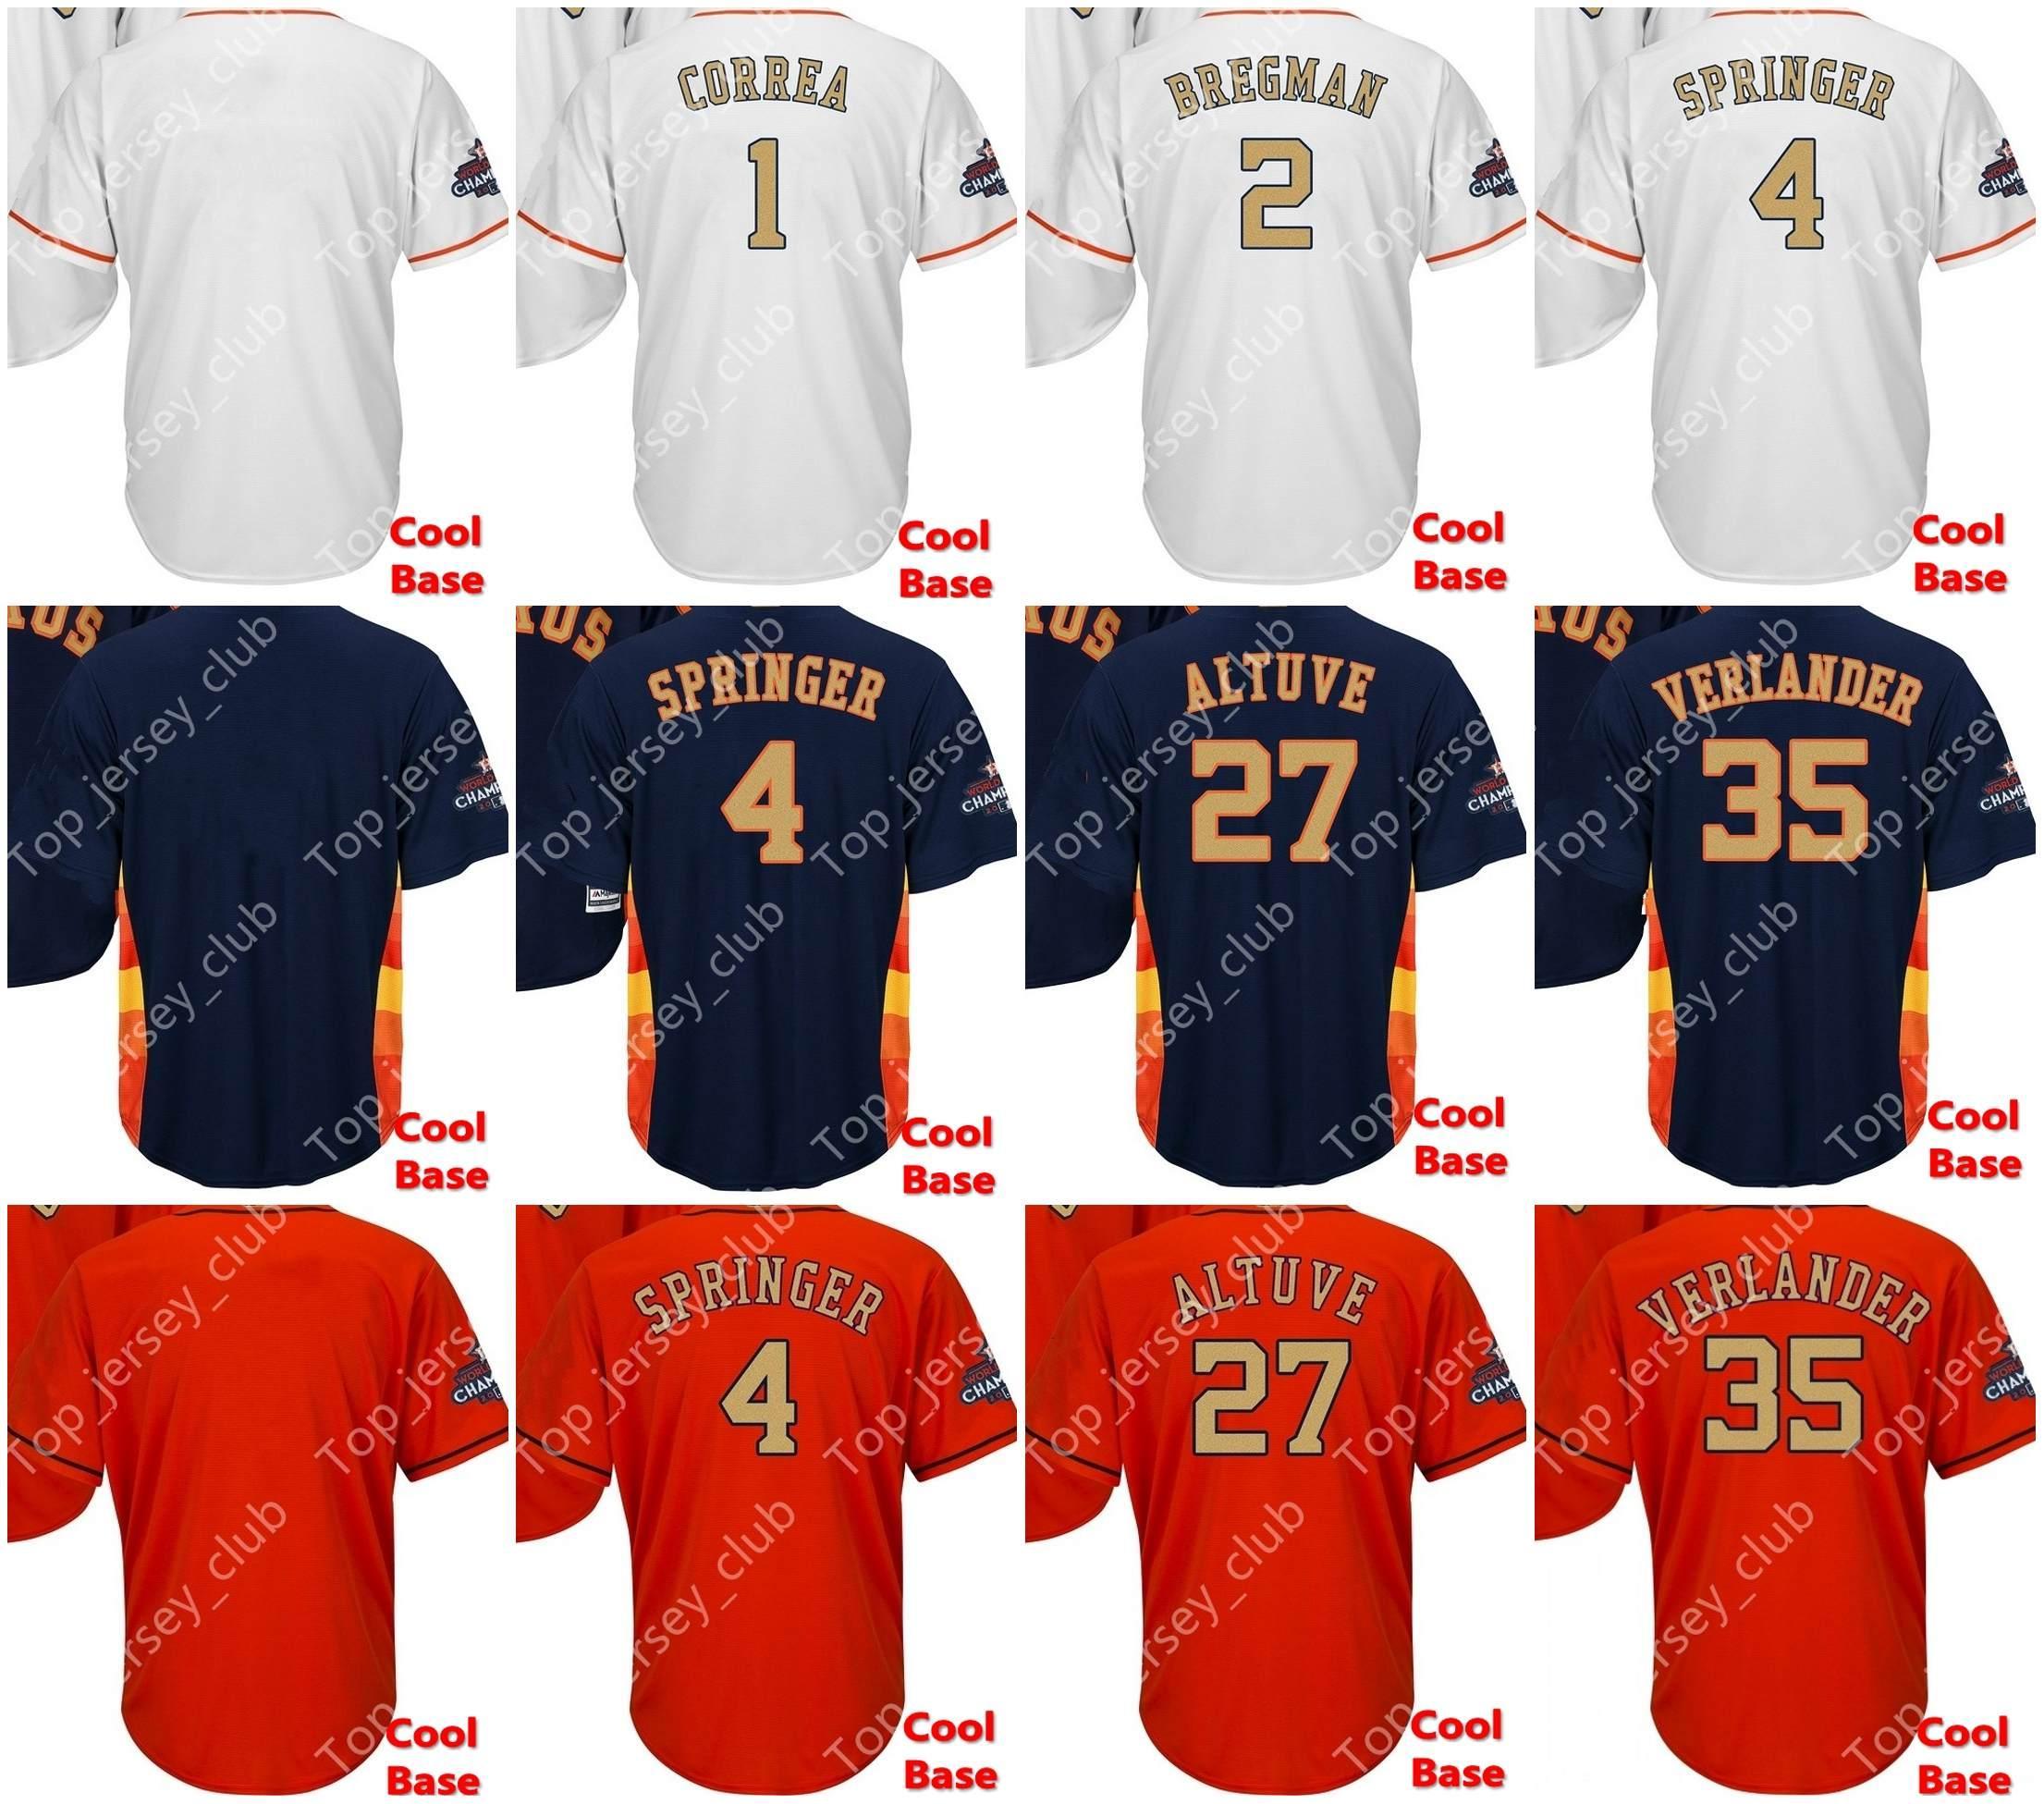 hot sale online e59f3 aba81 2019 Cool Base Gold Houston Baseball Jersey Men Women Youth Custom Signed  Astros 1 Correa 2 Bregman 4 Springer 27 Altuve 35 Justin Verlander From ...